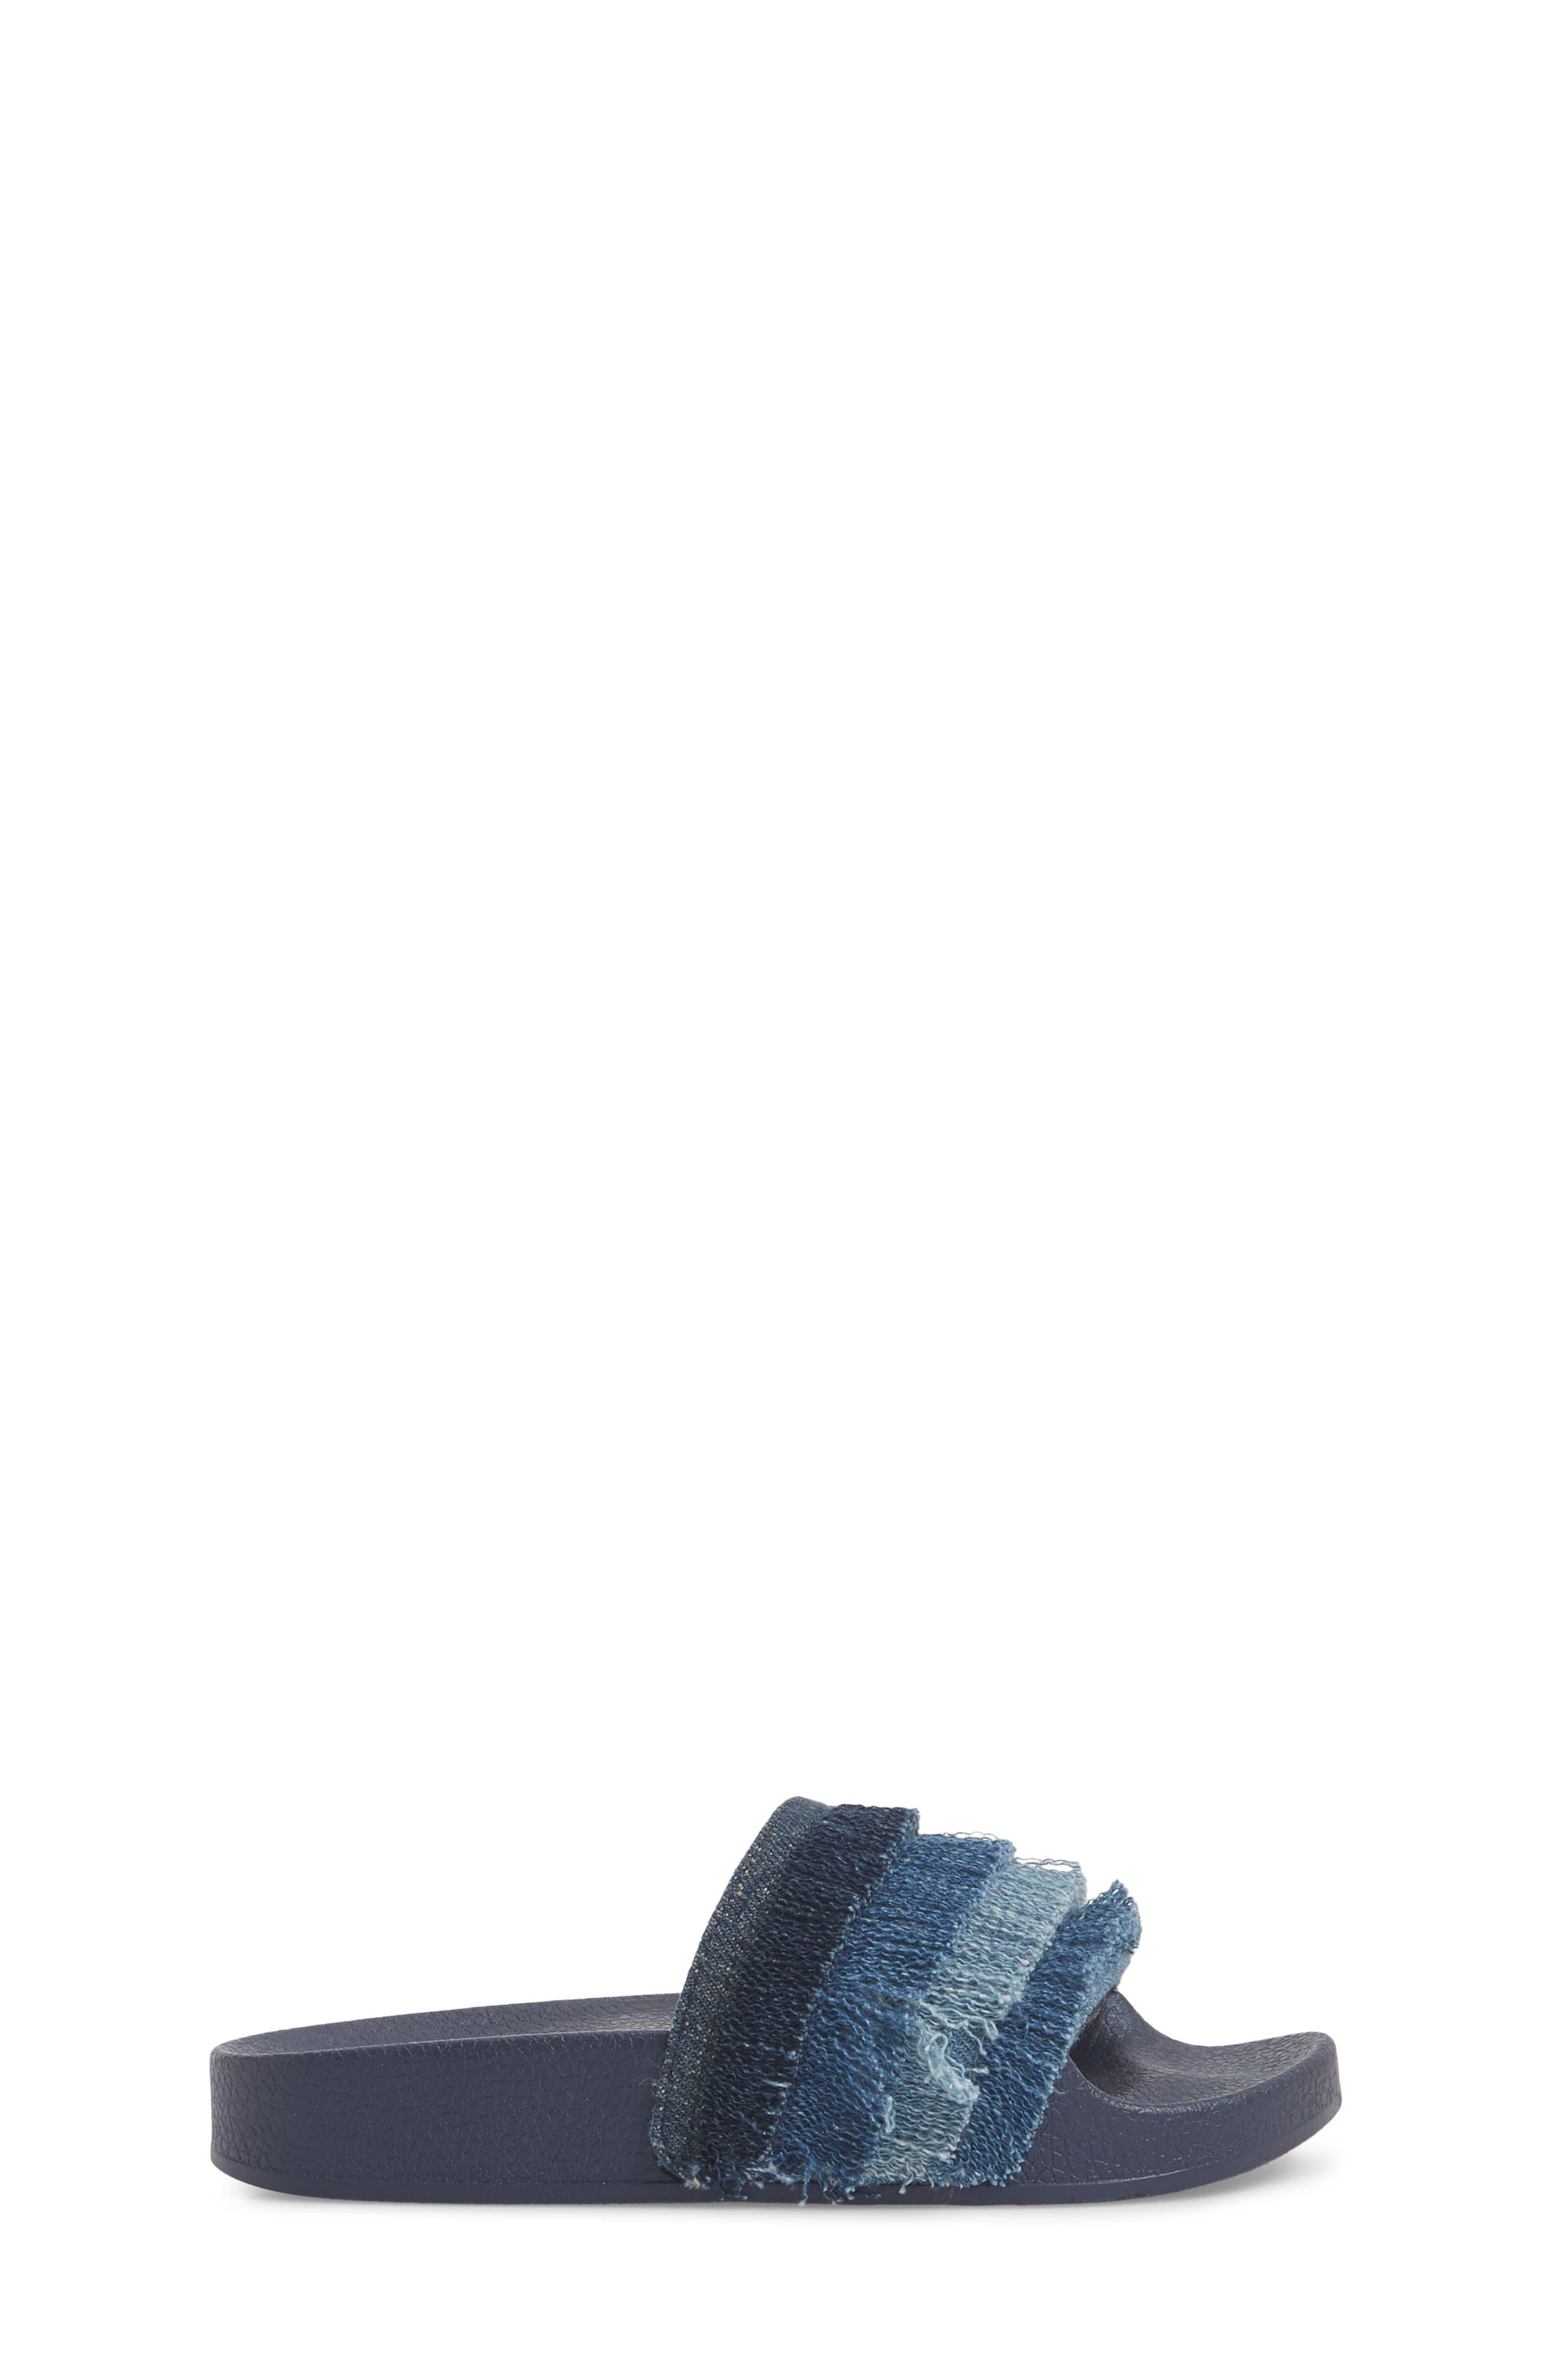 Reaction Kenneth Cole Shower Fray Slide Sandal,                             Alternate thumbnail 3, color,                             Denim